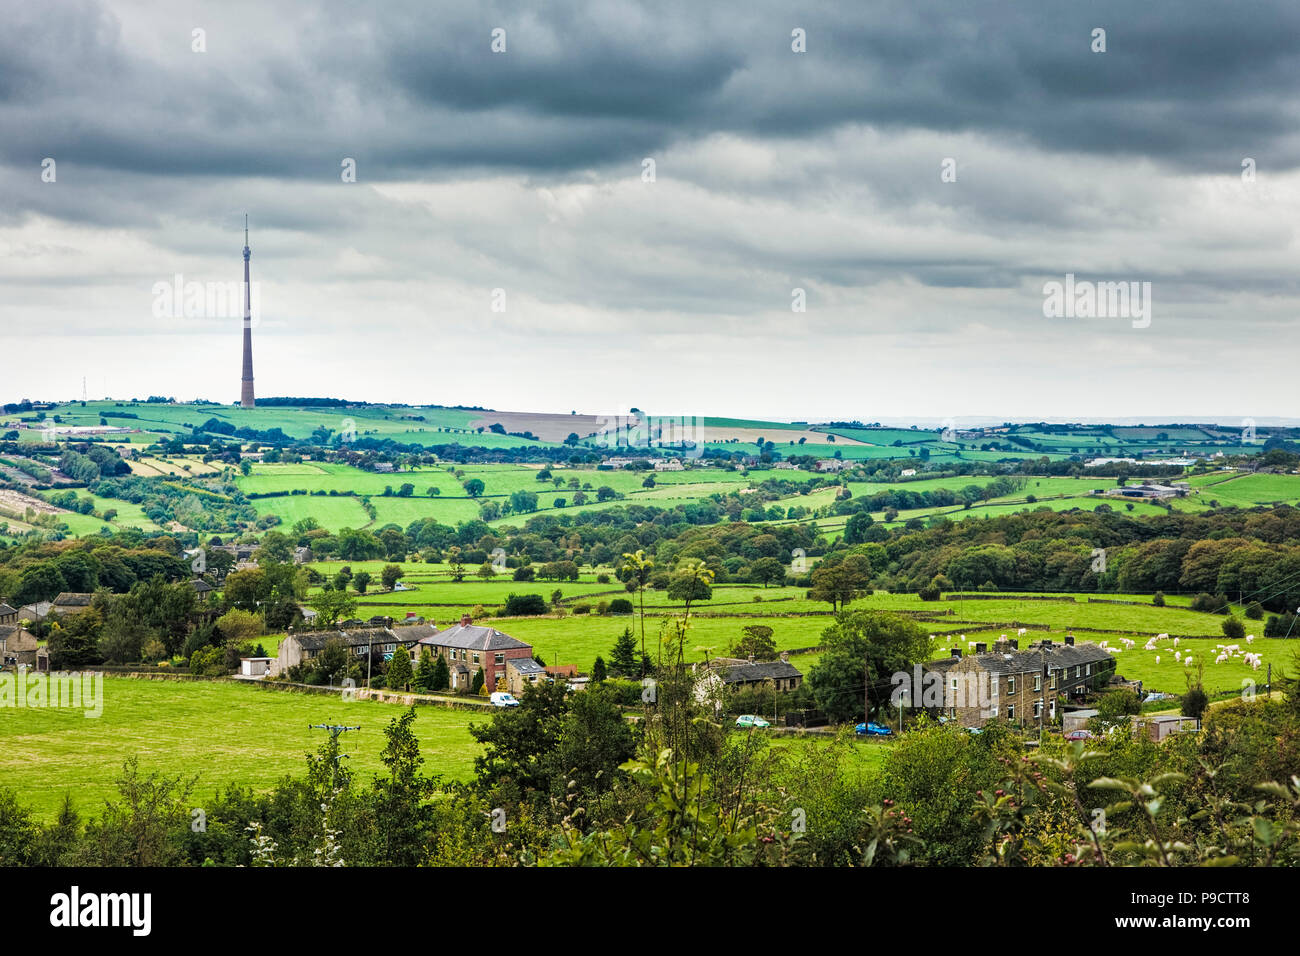 Emley Moor Tv Transmitter, and West Yorkshire landscape, England, UK - Stock Image